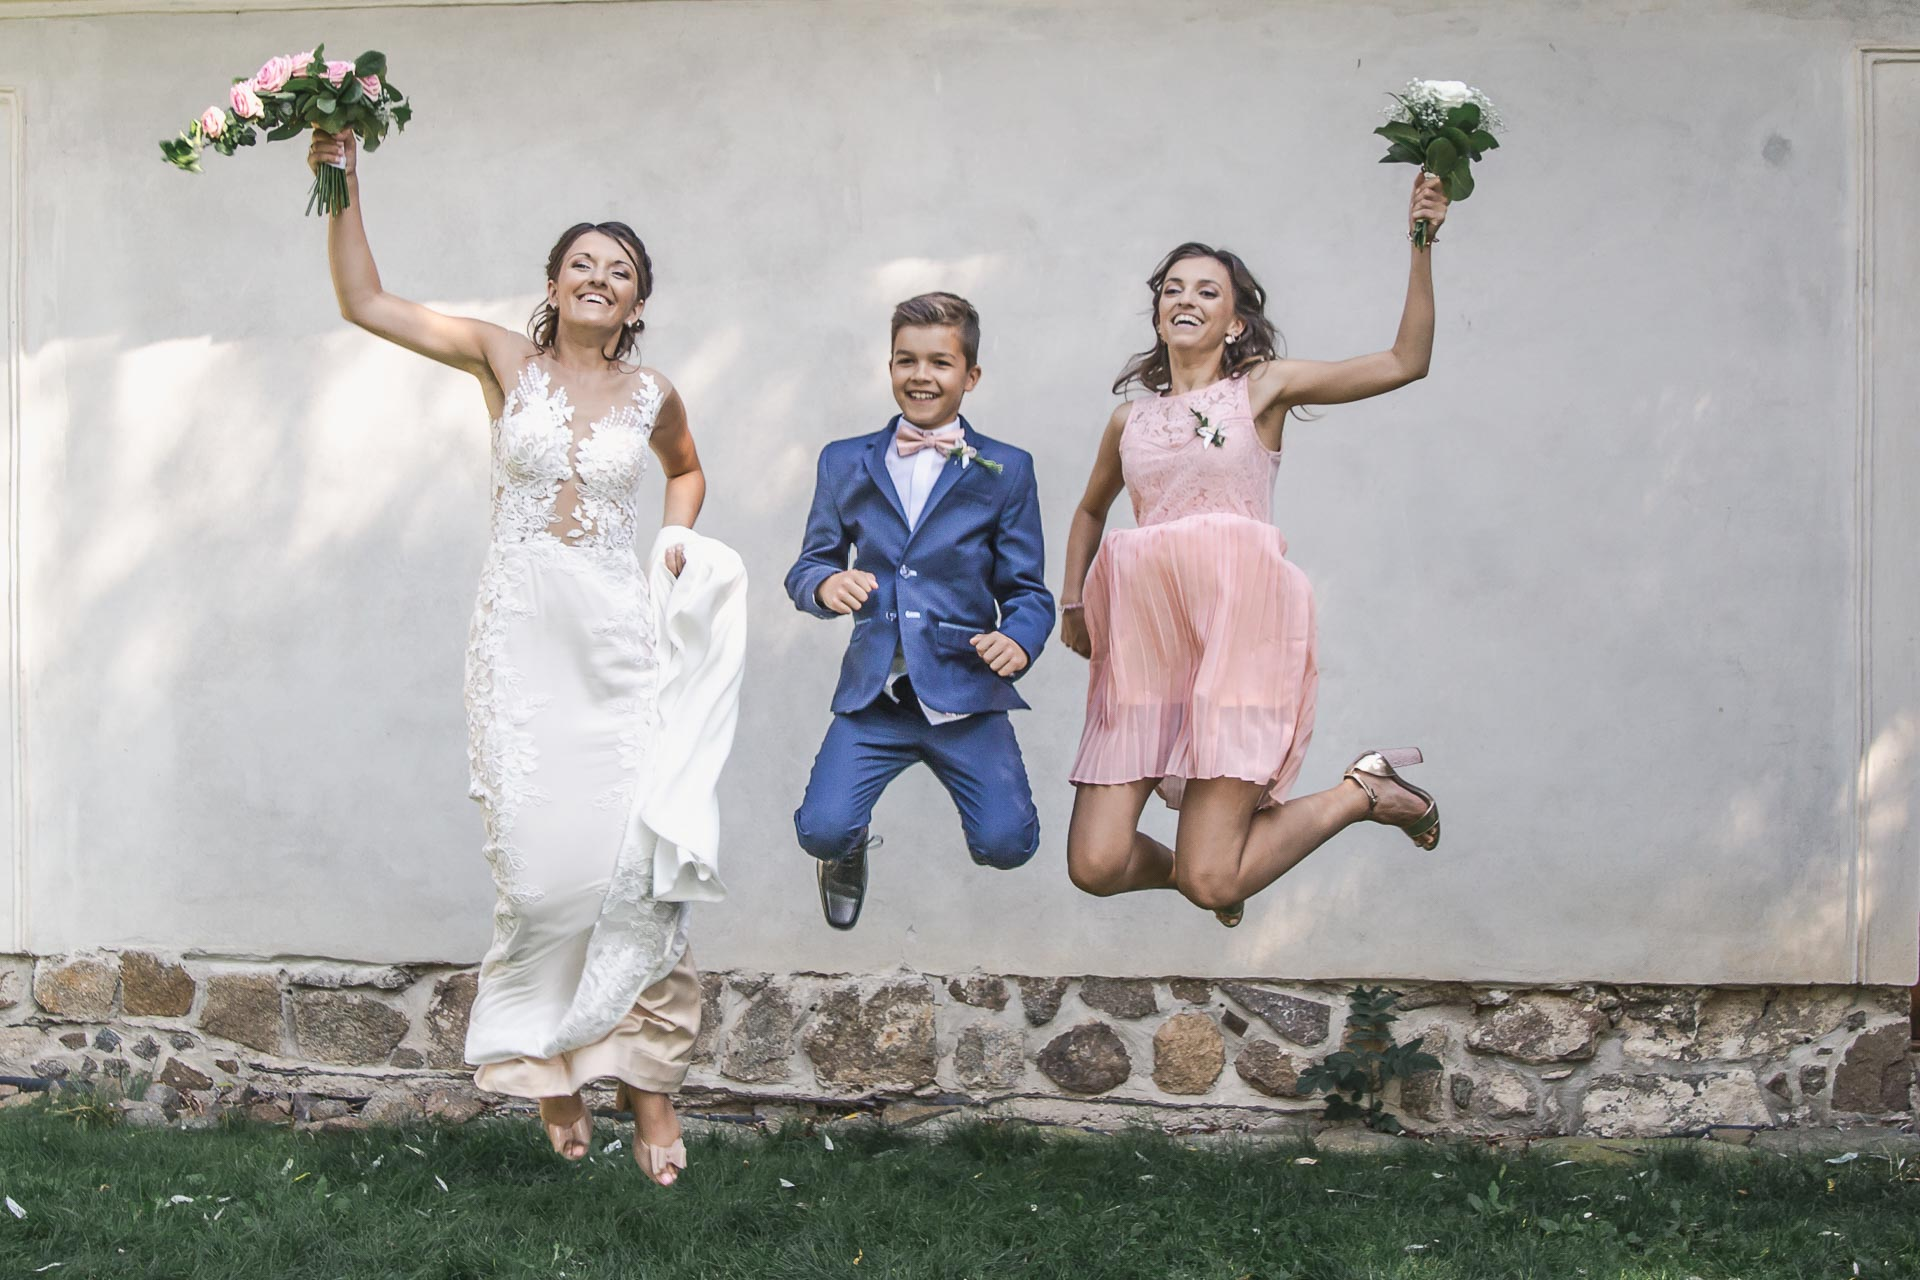 svatební-fotograf-wedding-svatebni-video-orlík-vltava-kostel-statek-stodola-boho-svatba-Beautyfoto-421